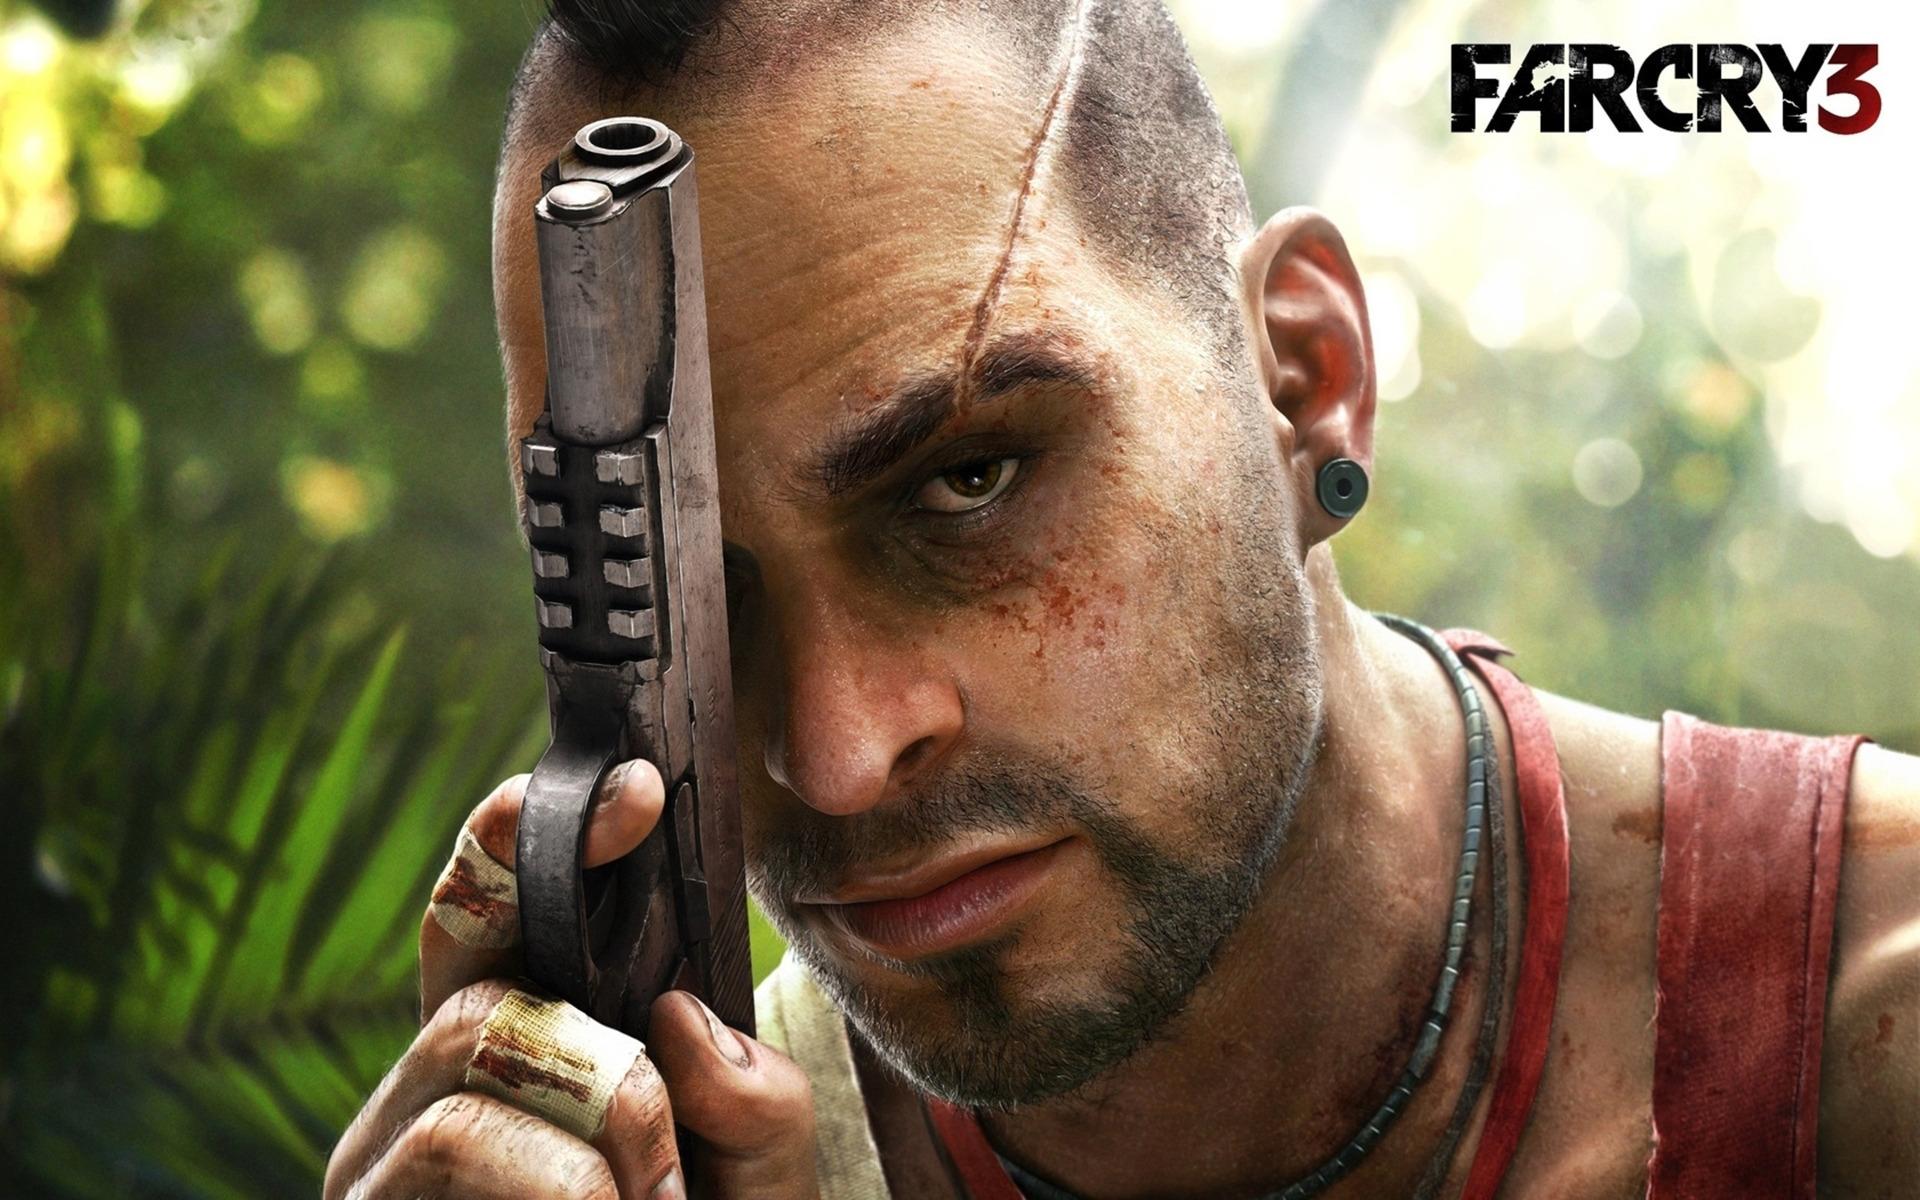 Far Cry 3 Hd Wallpaper Wallpaperfx